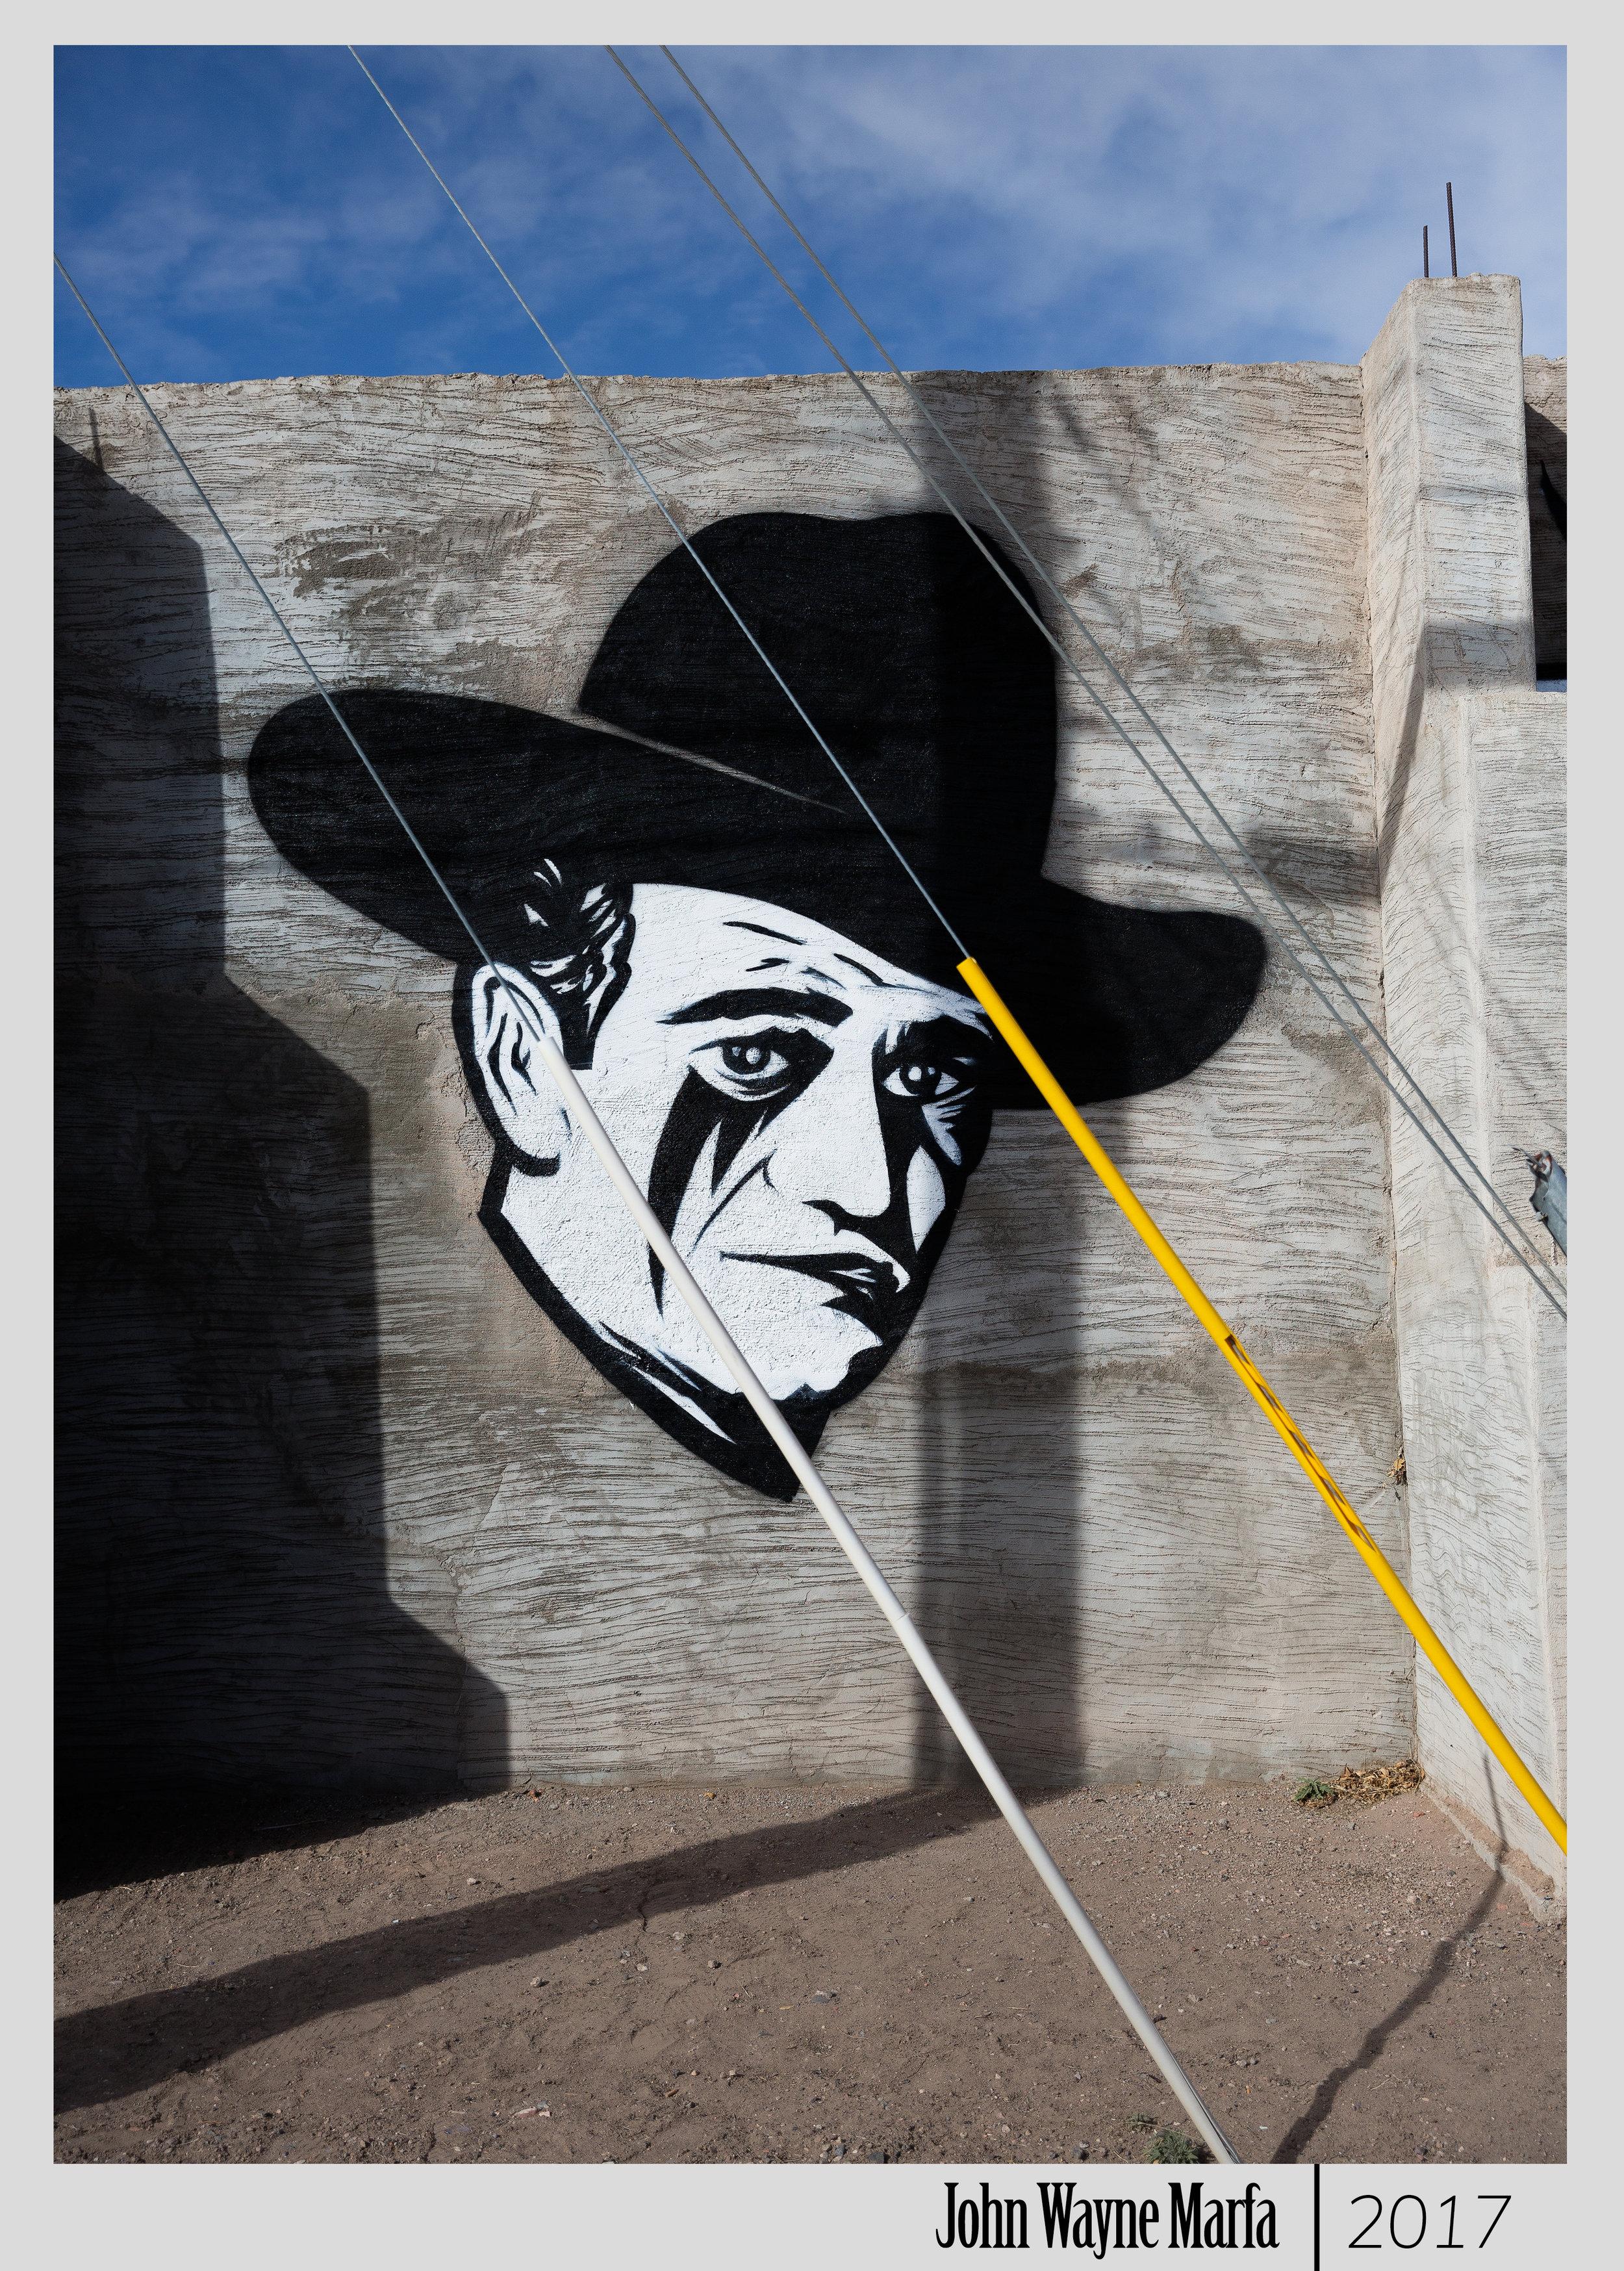 John-Wayne-Marfa.jpg